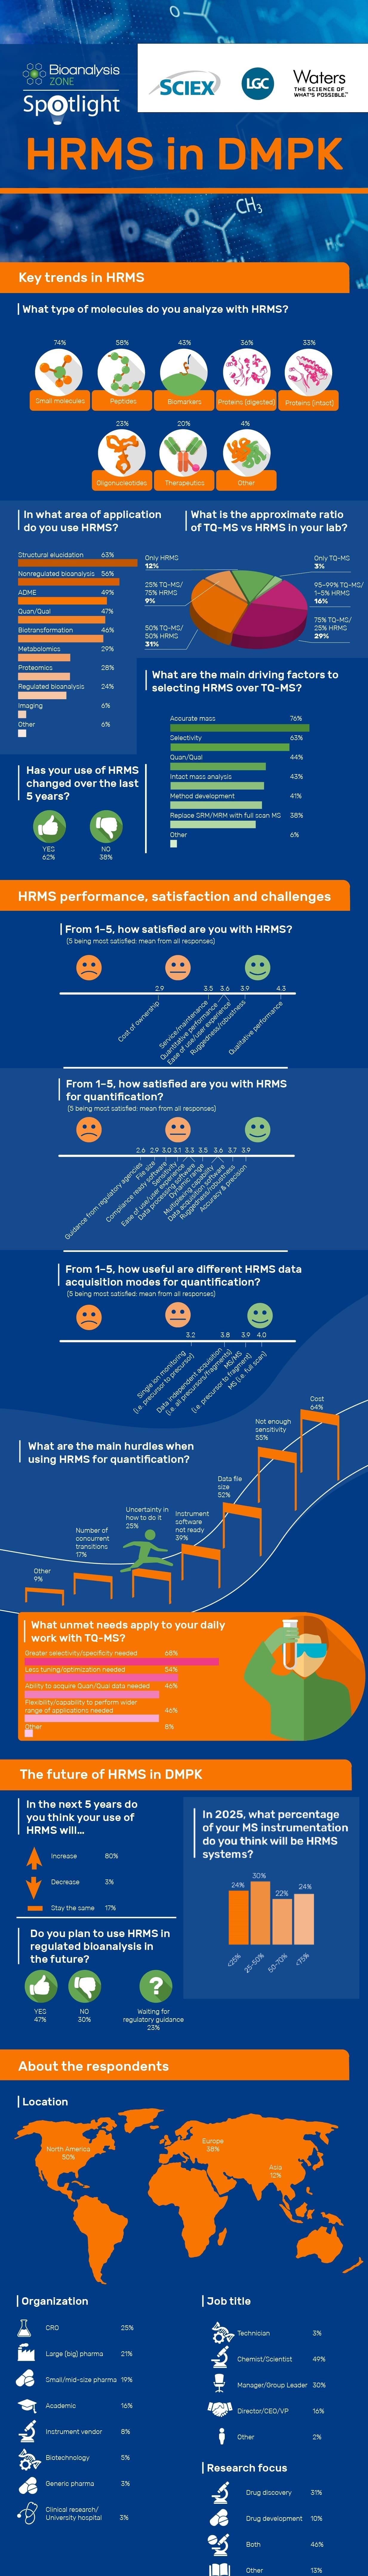 HRMS in DMPK spotlight infographic_NM-01-min